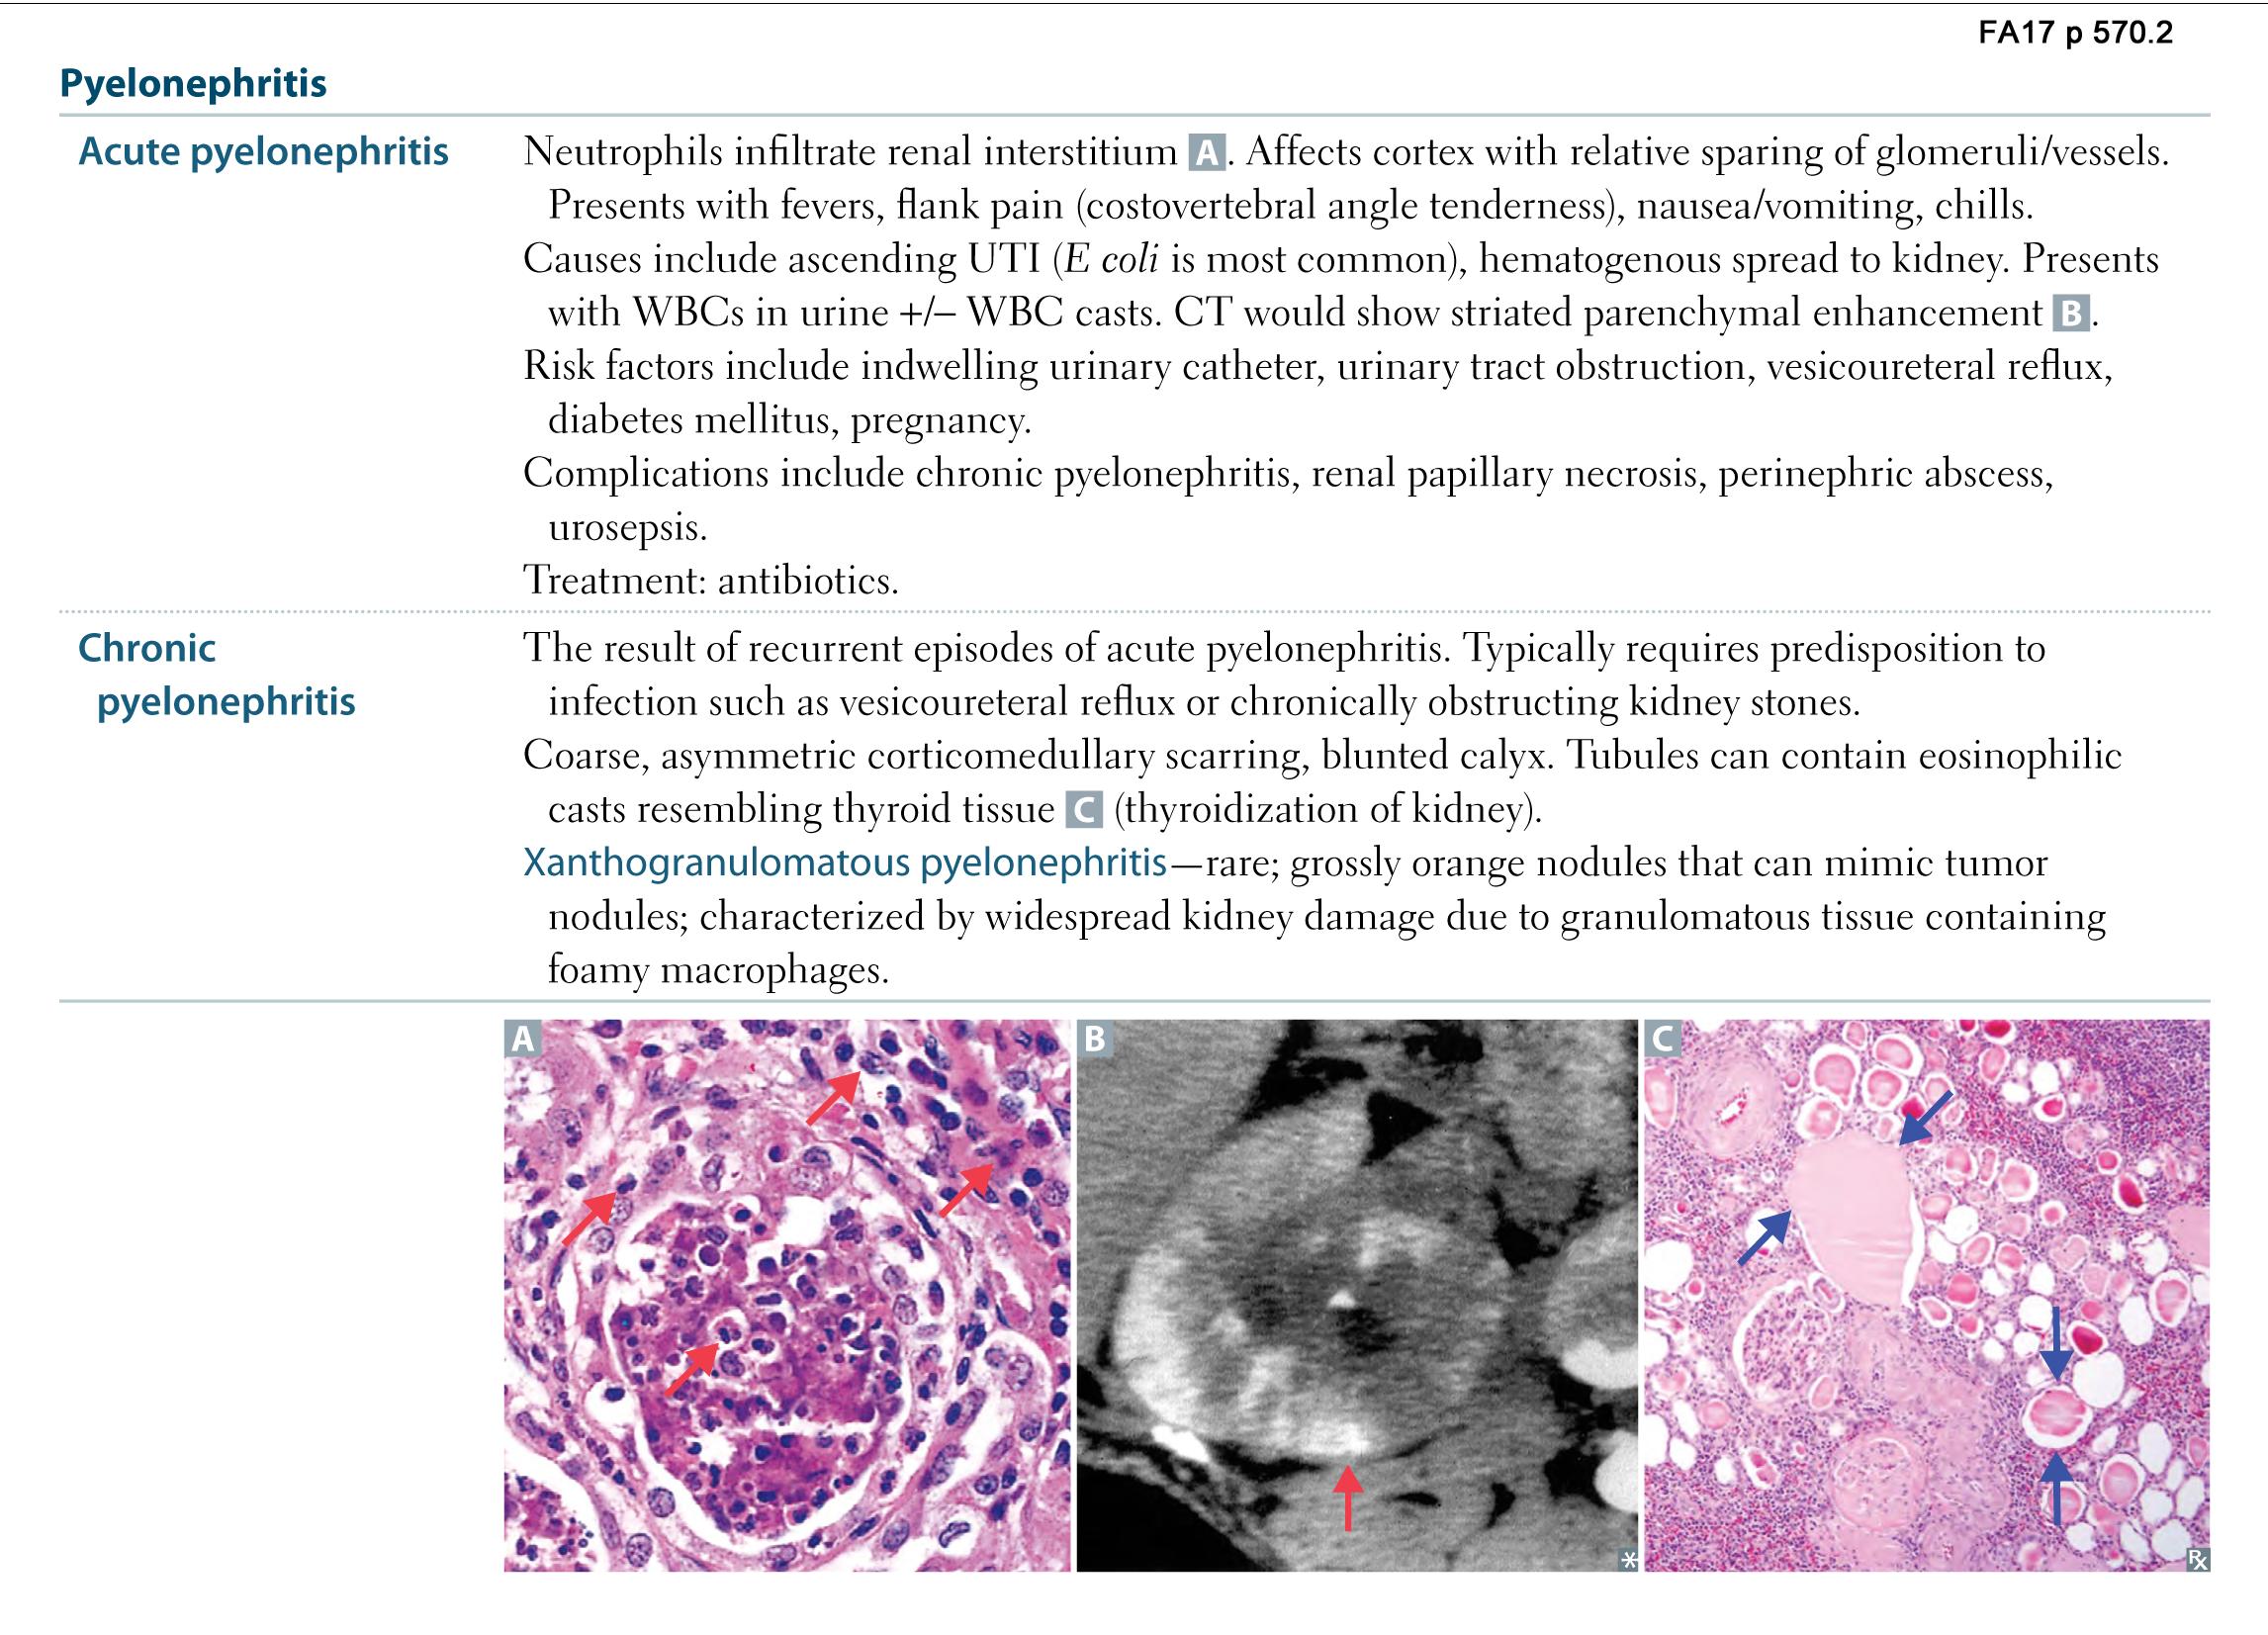 Renal Pathology - Pyelonephritis (USMLE Rx 2017: Renal - Pathology